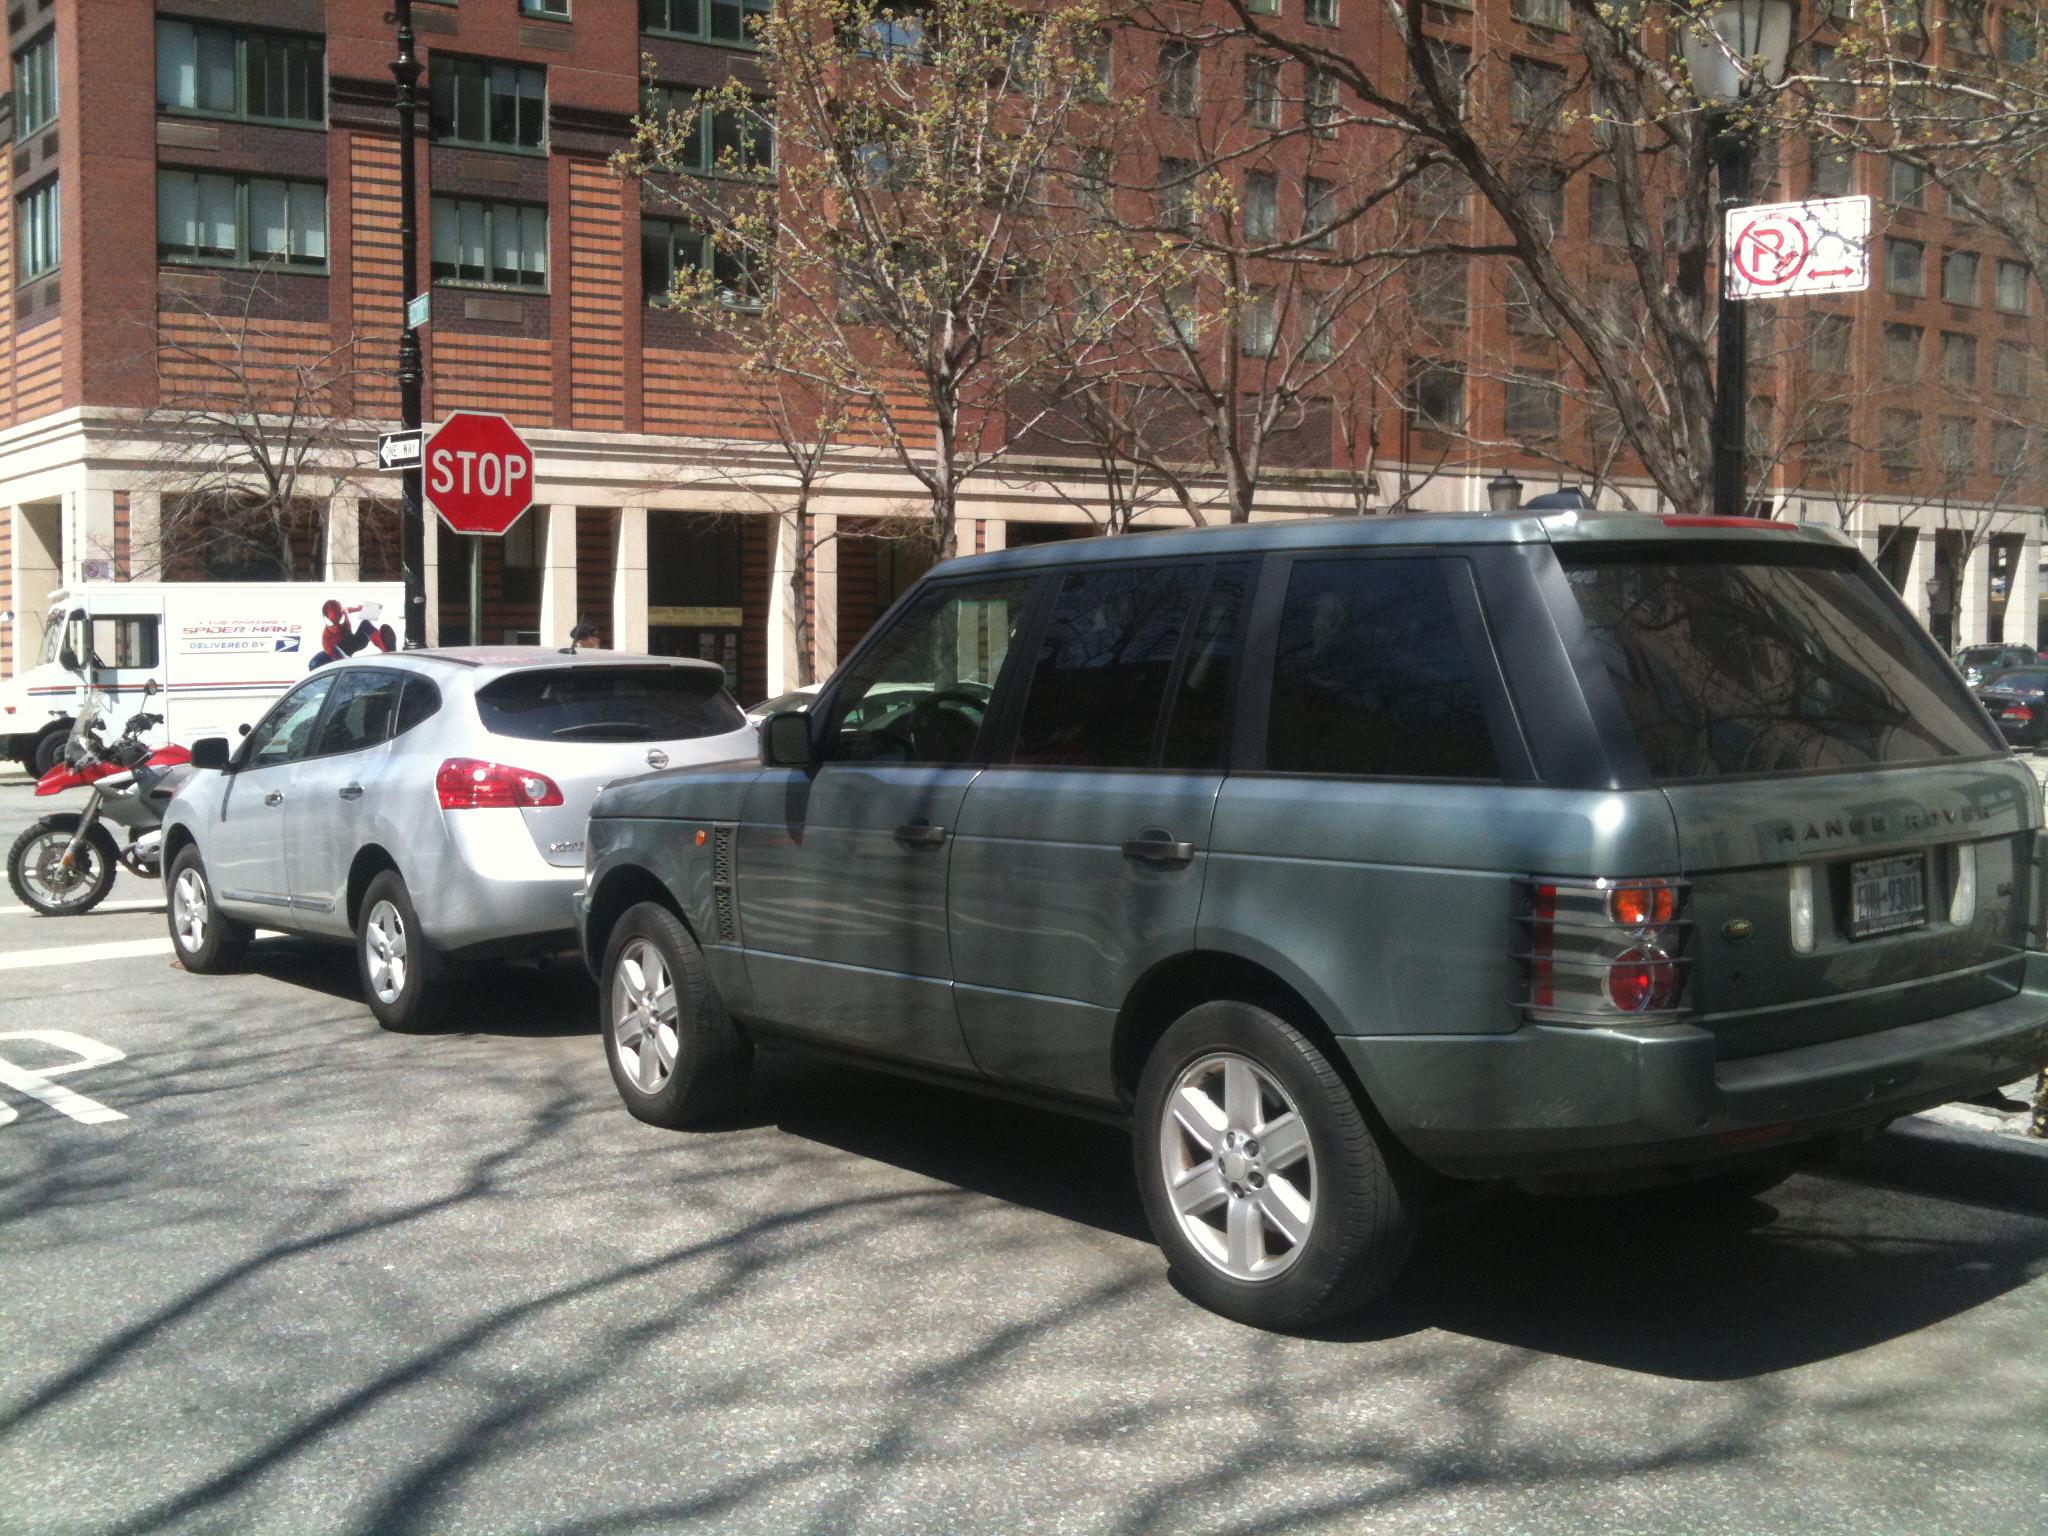 Range Rover parked